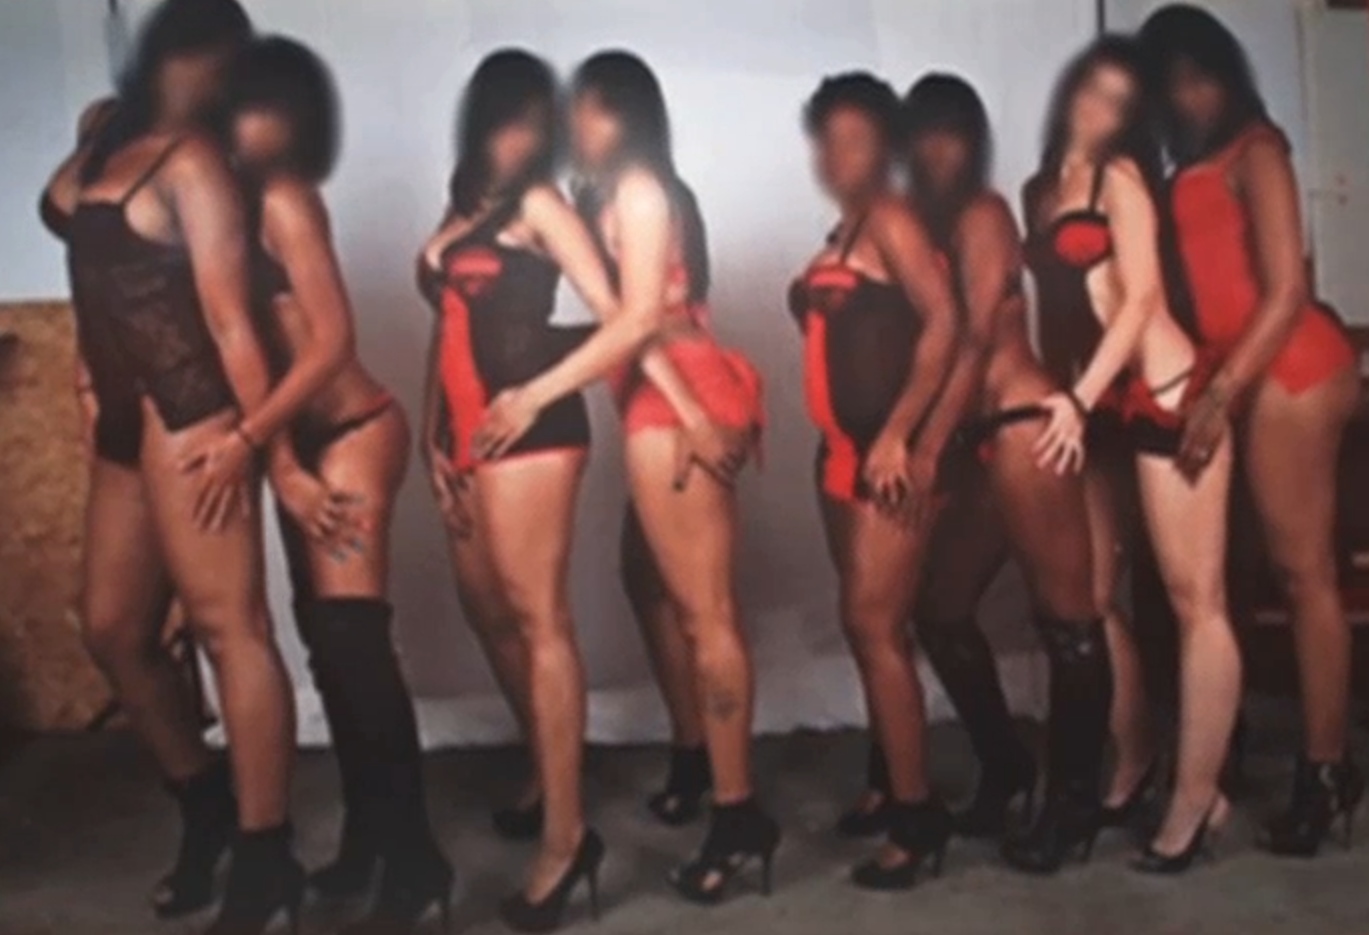 el asesino de prostitutas en barcelona cristiano ronaldo prostitutas